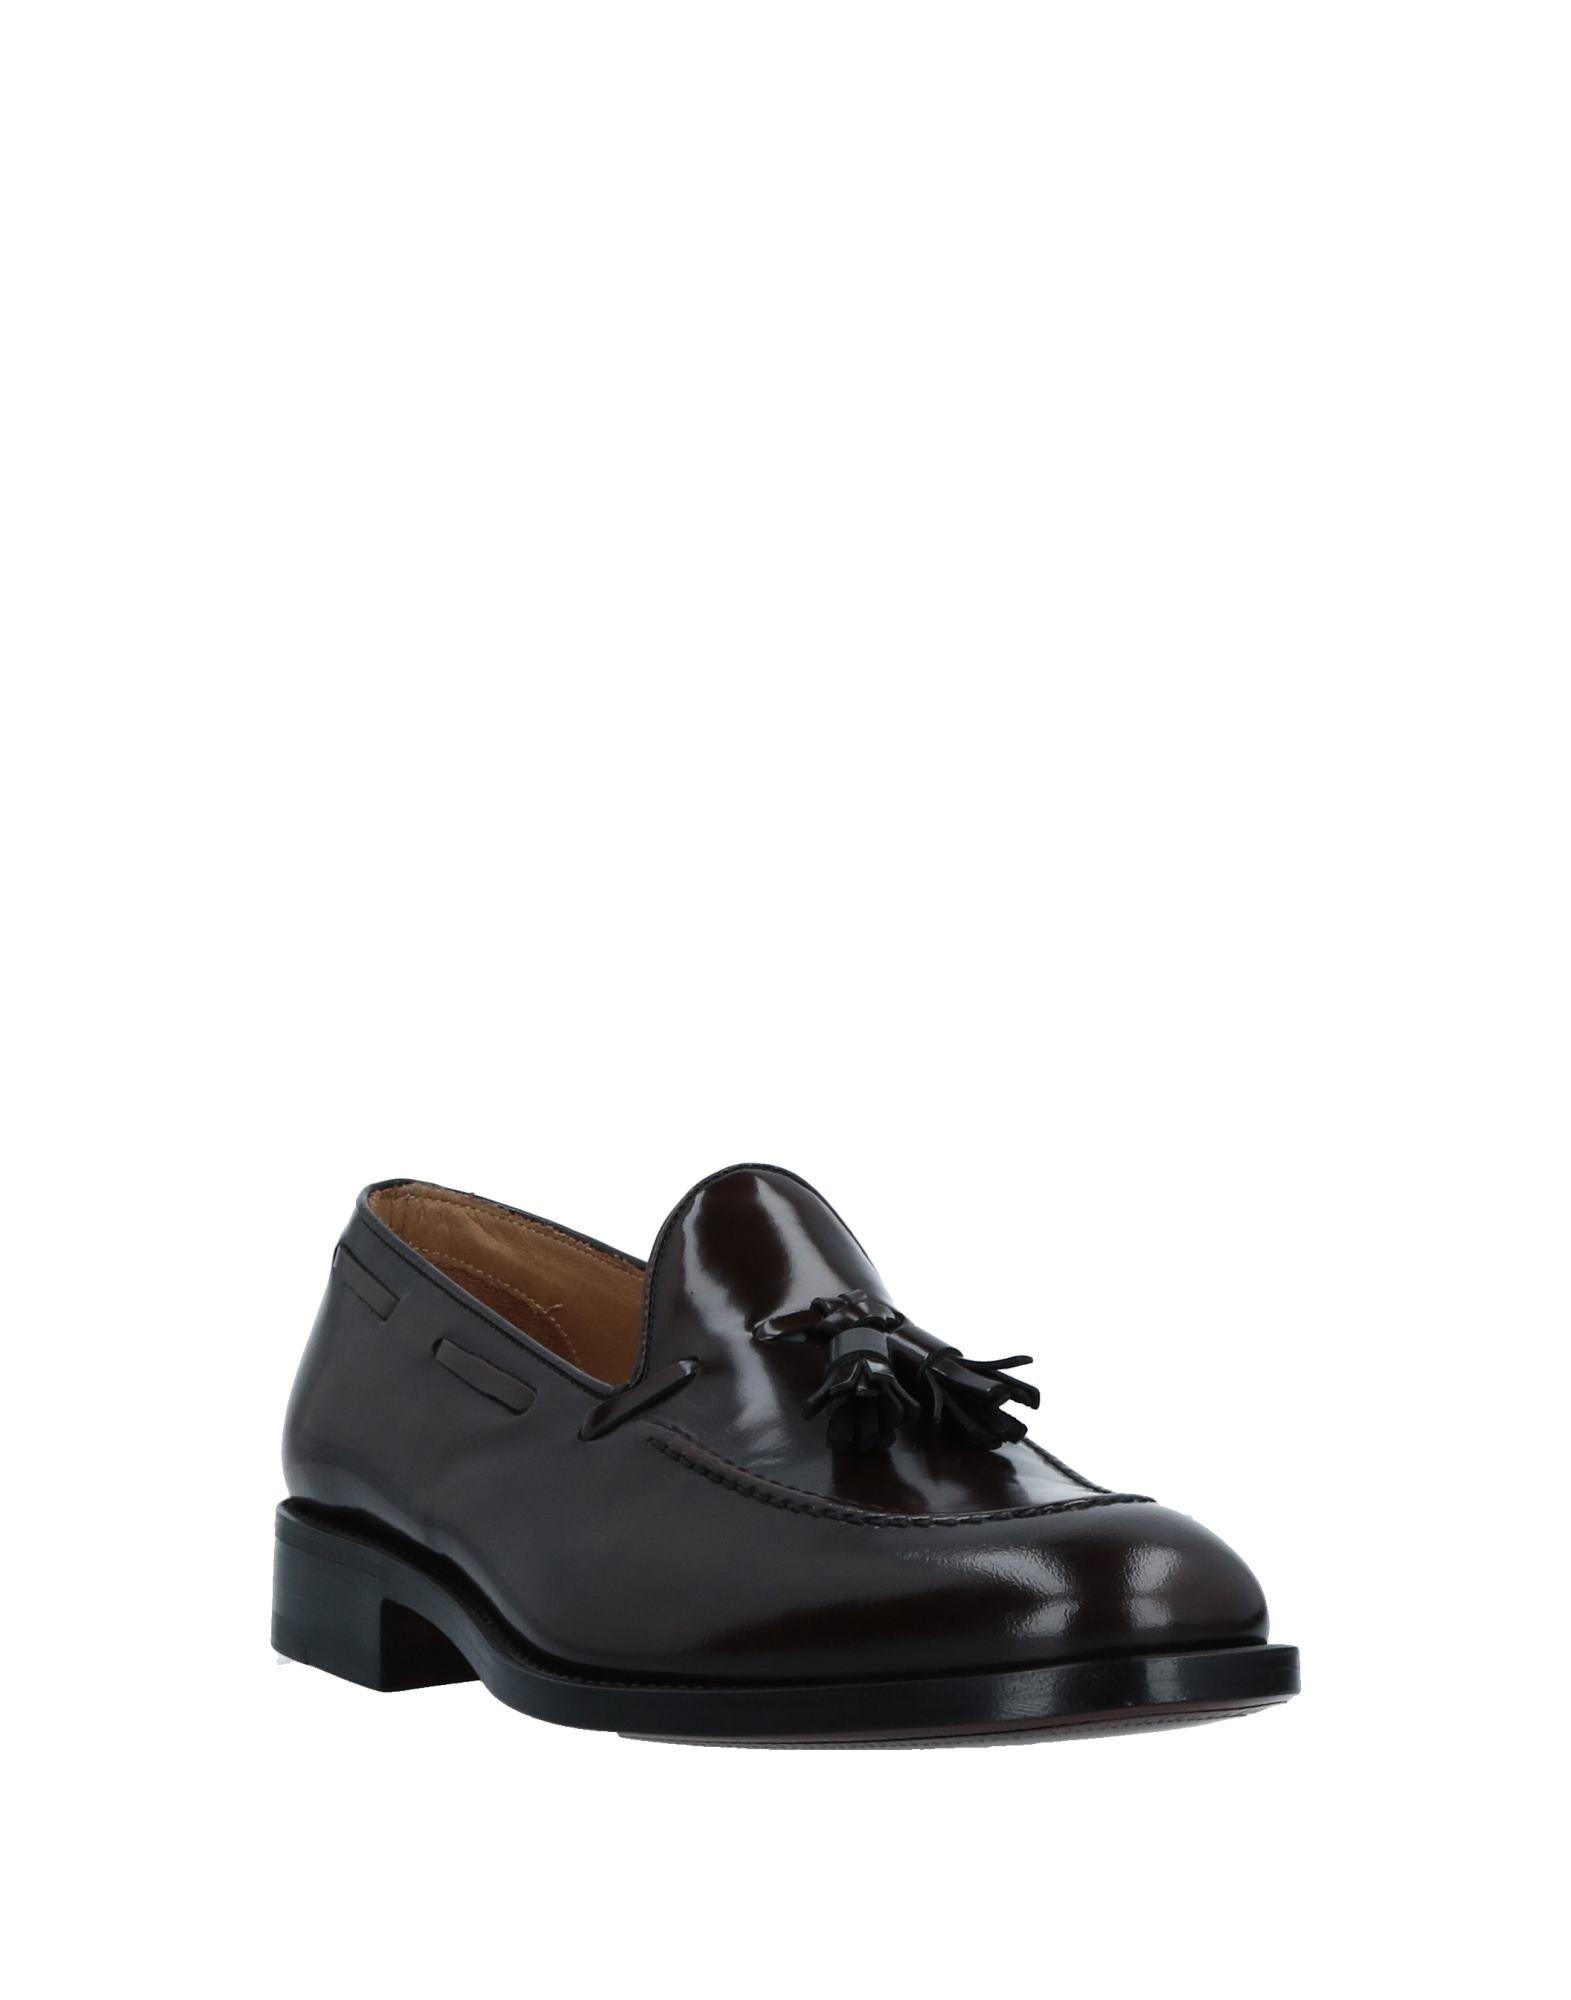 Aranth Mokassins Herren  11517387HA Gute Qualität beliebte Schuhe